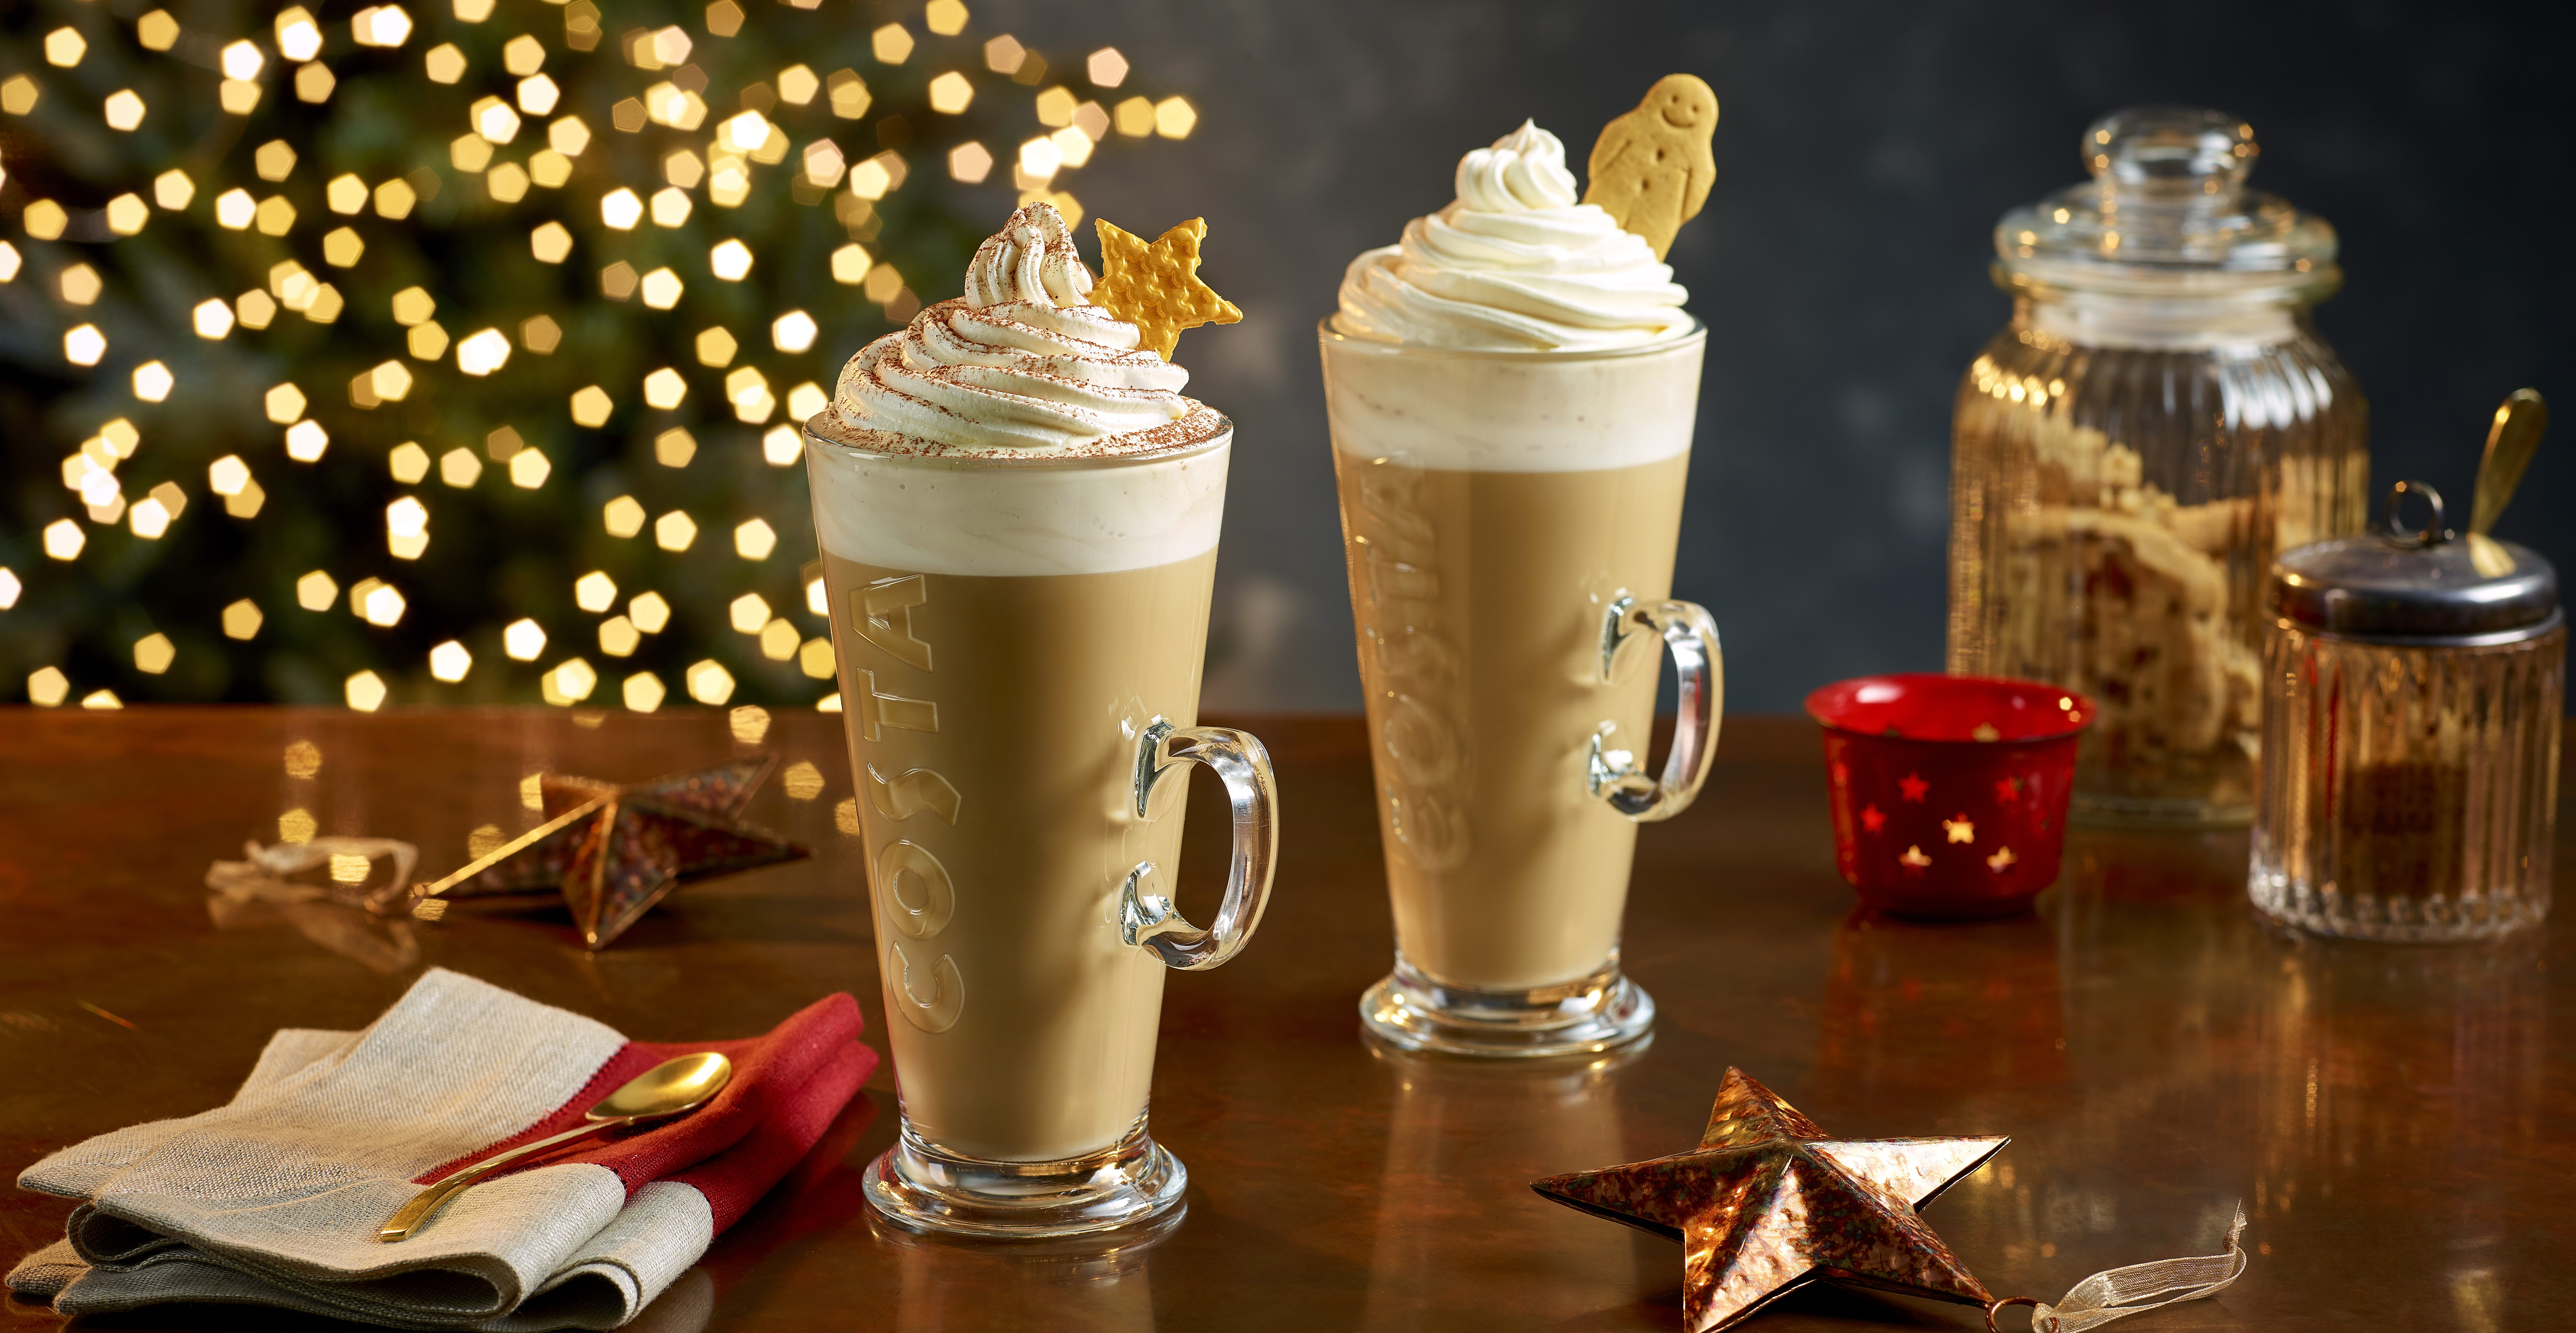 Costa Coffee announces new Irish Velvet range as it unveils its Christmas menu